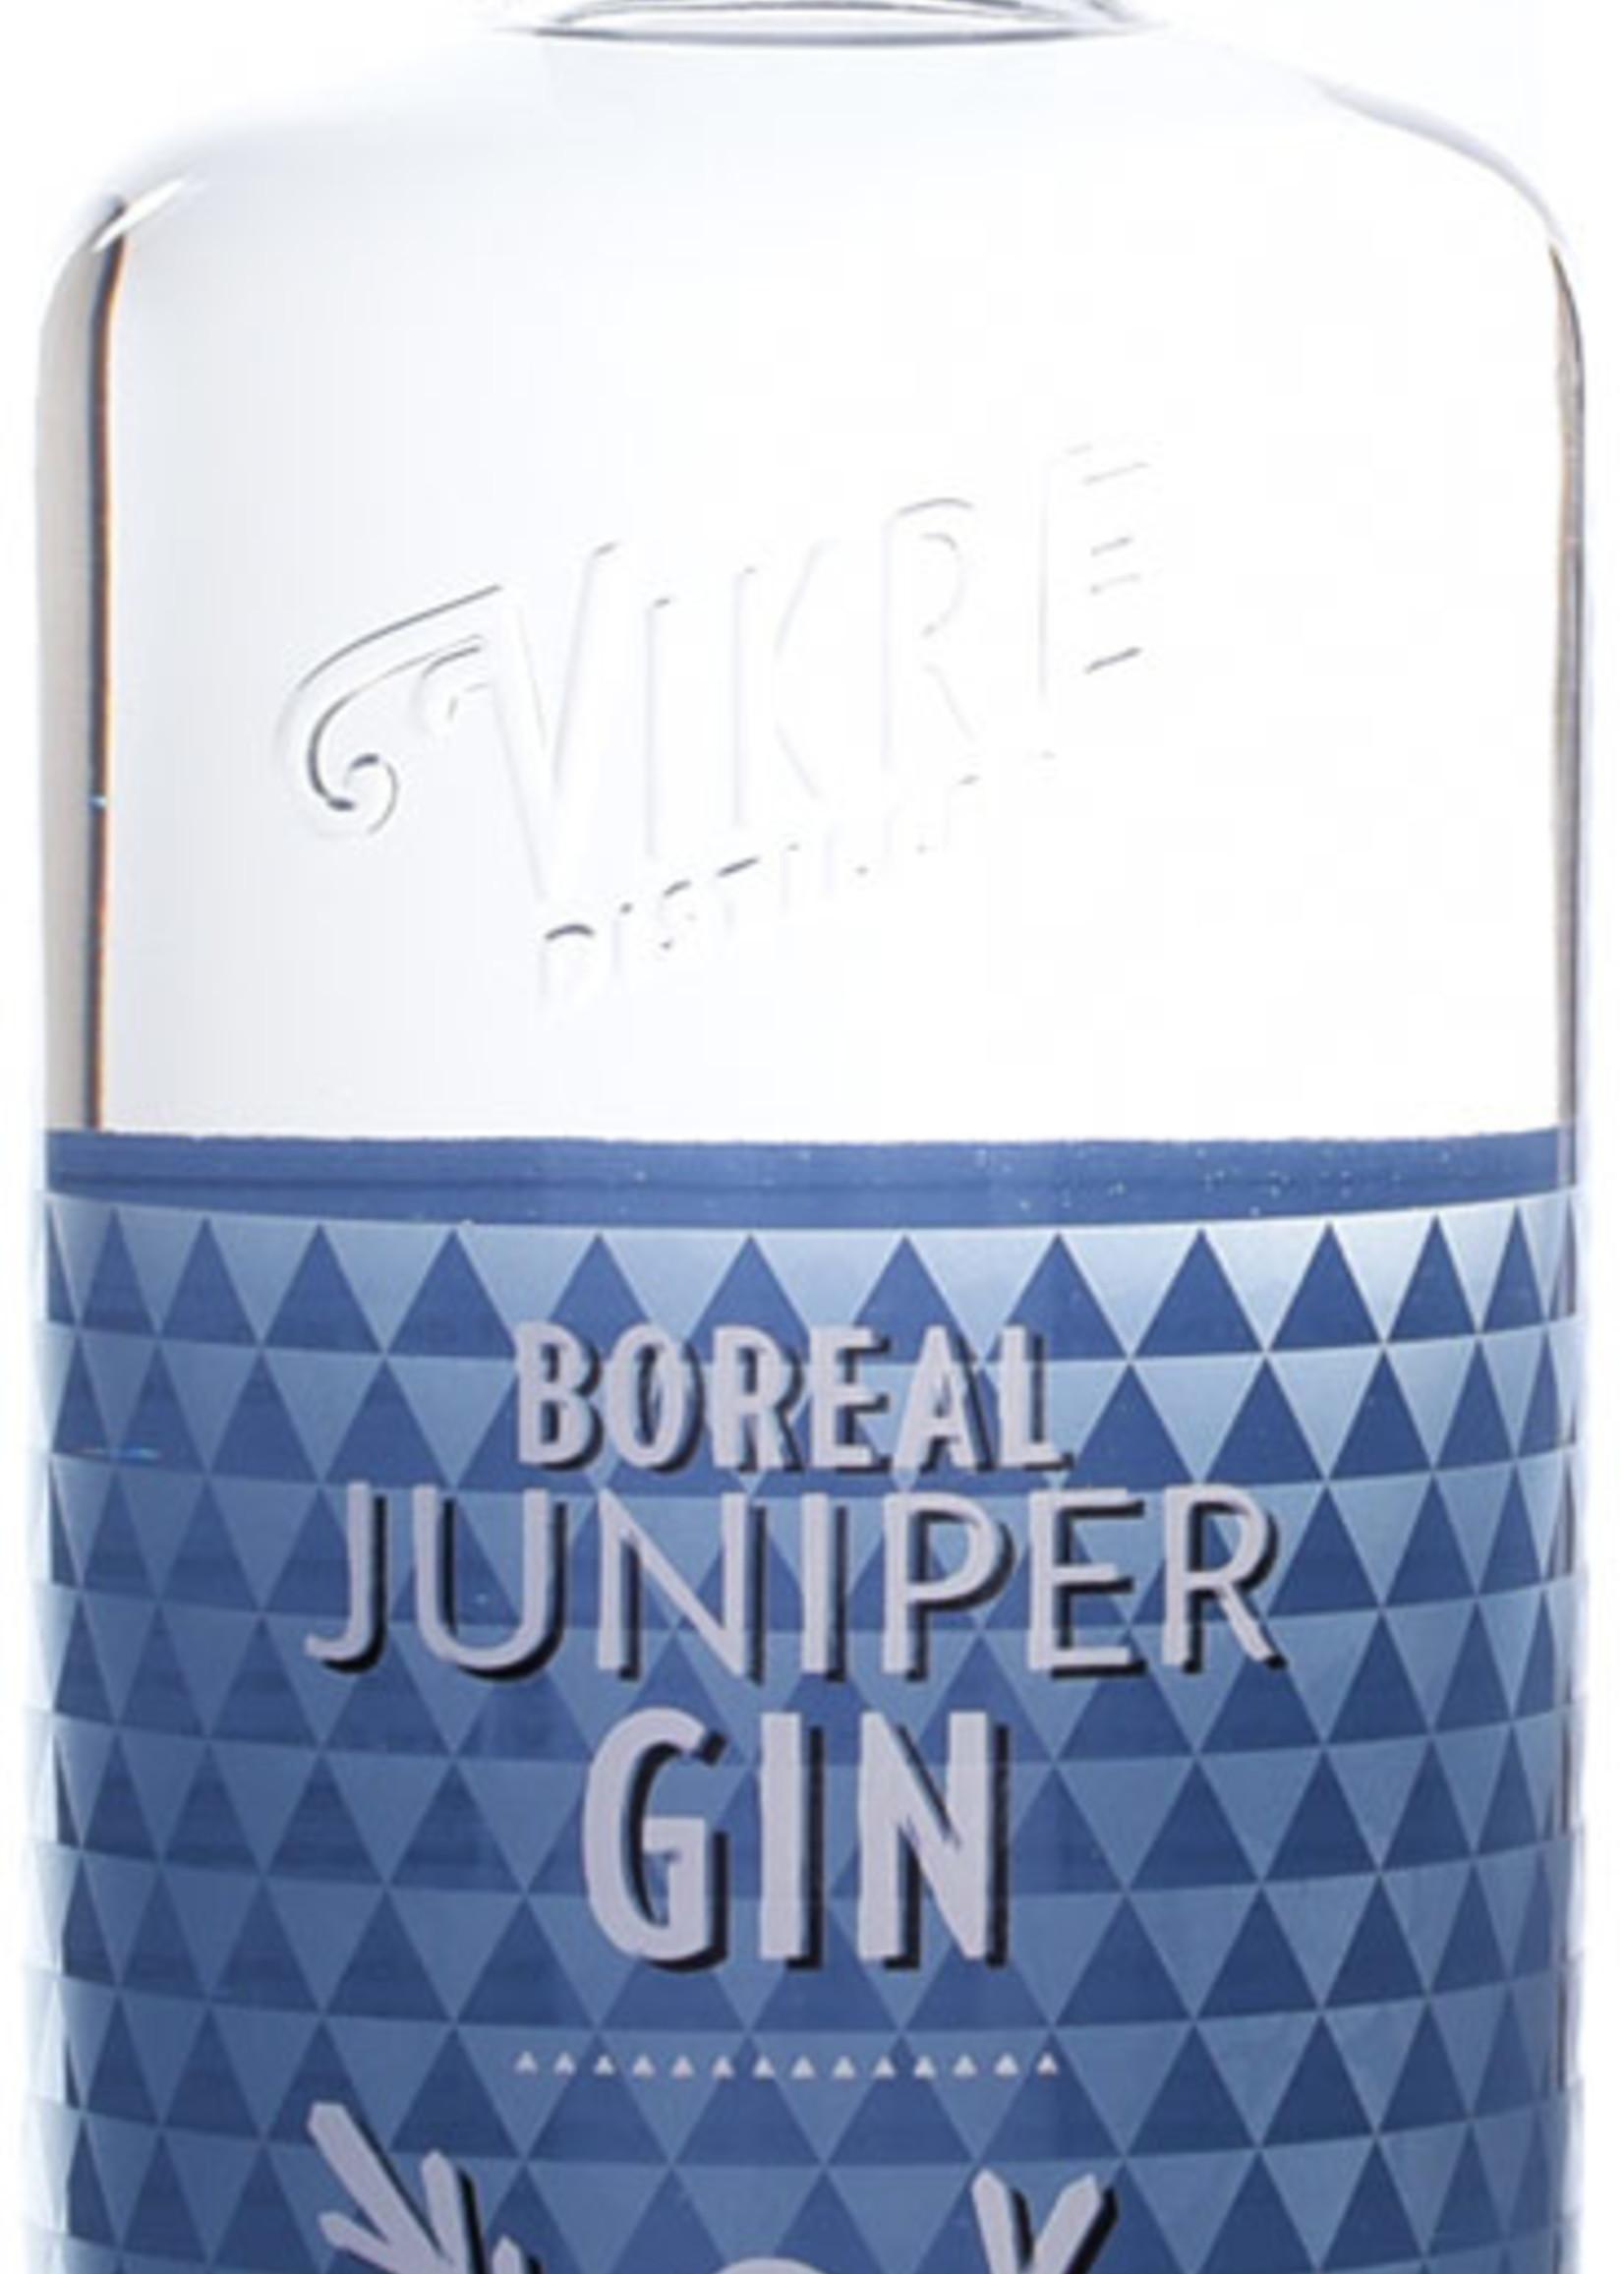 Vikre Boreal Juniper Gin